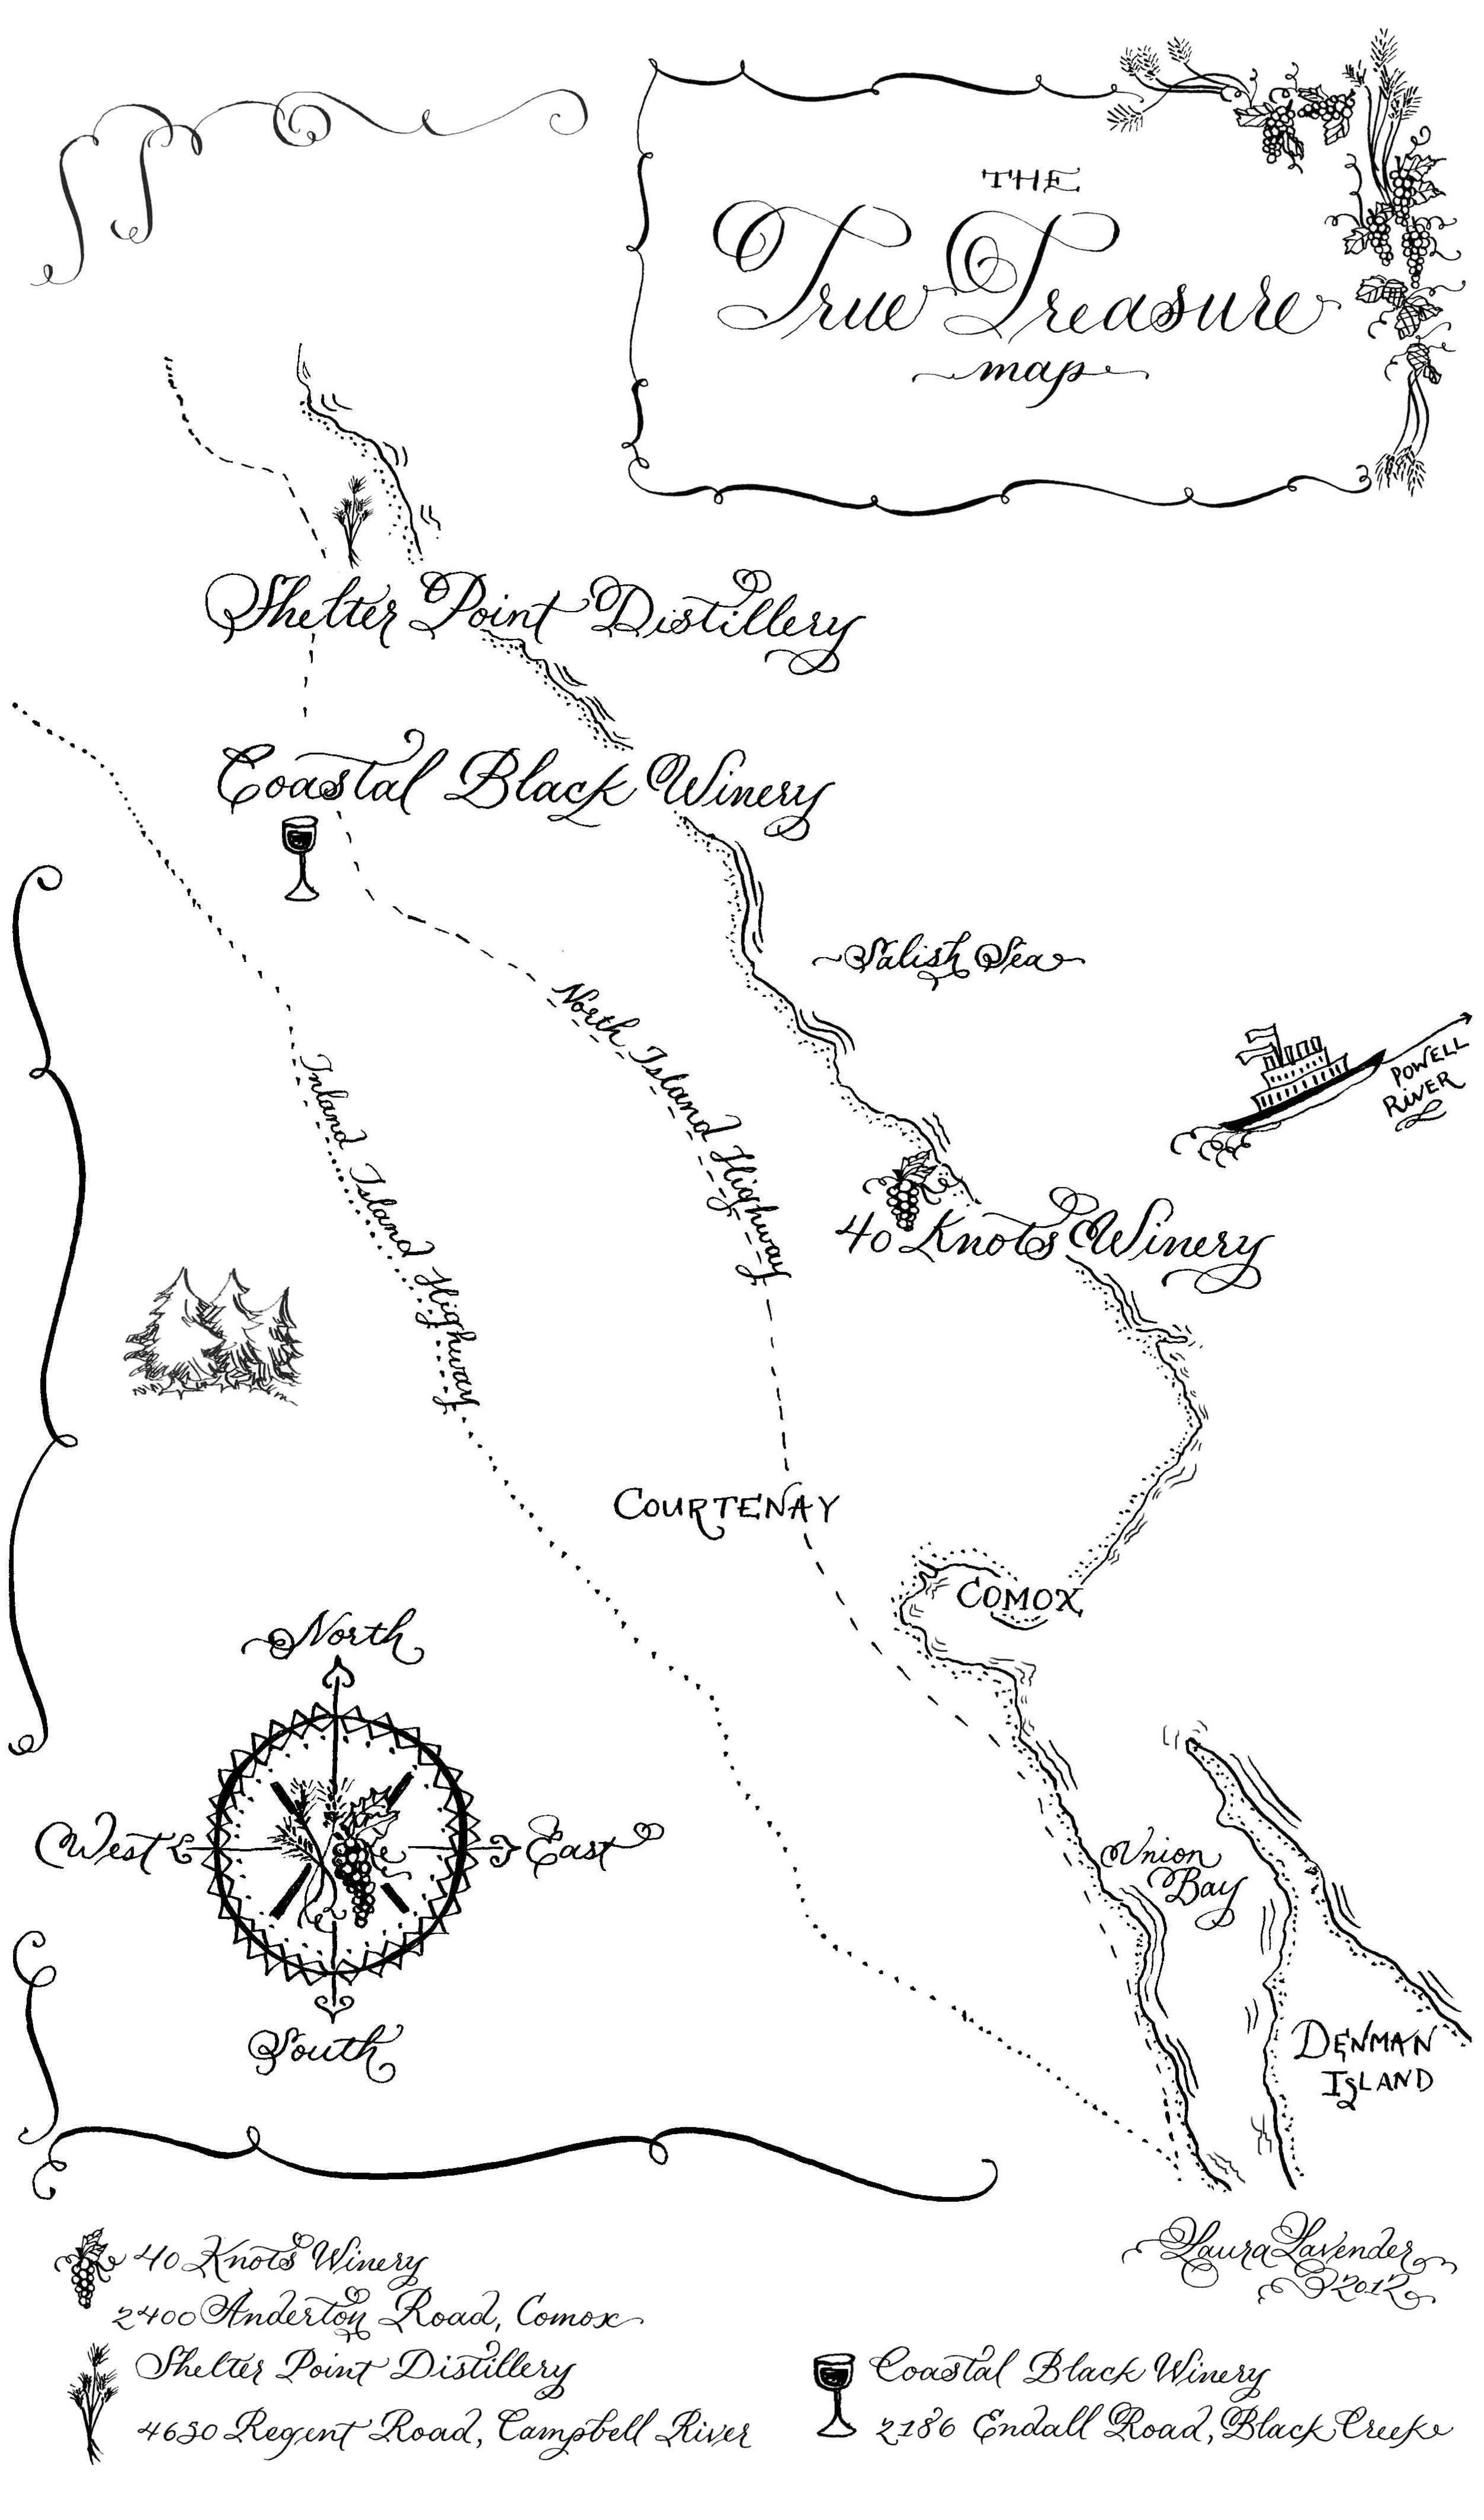 Winery map #3